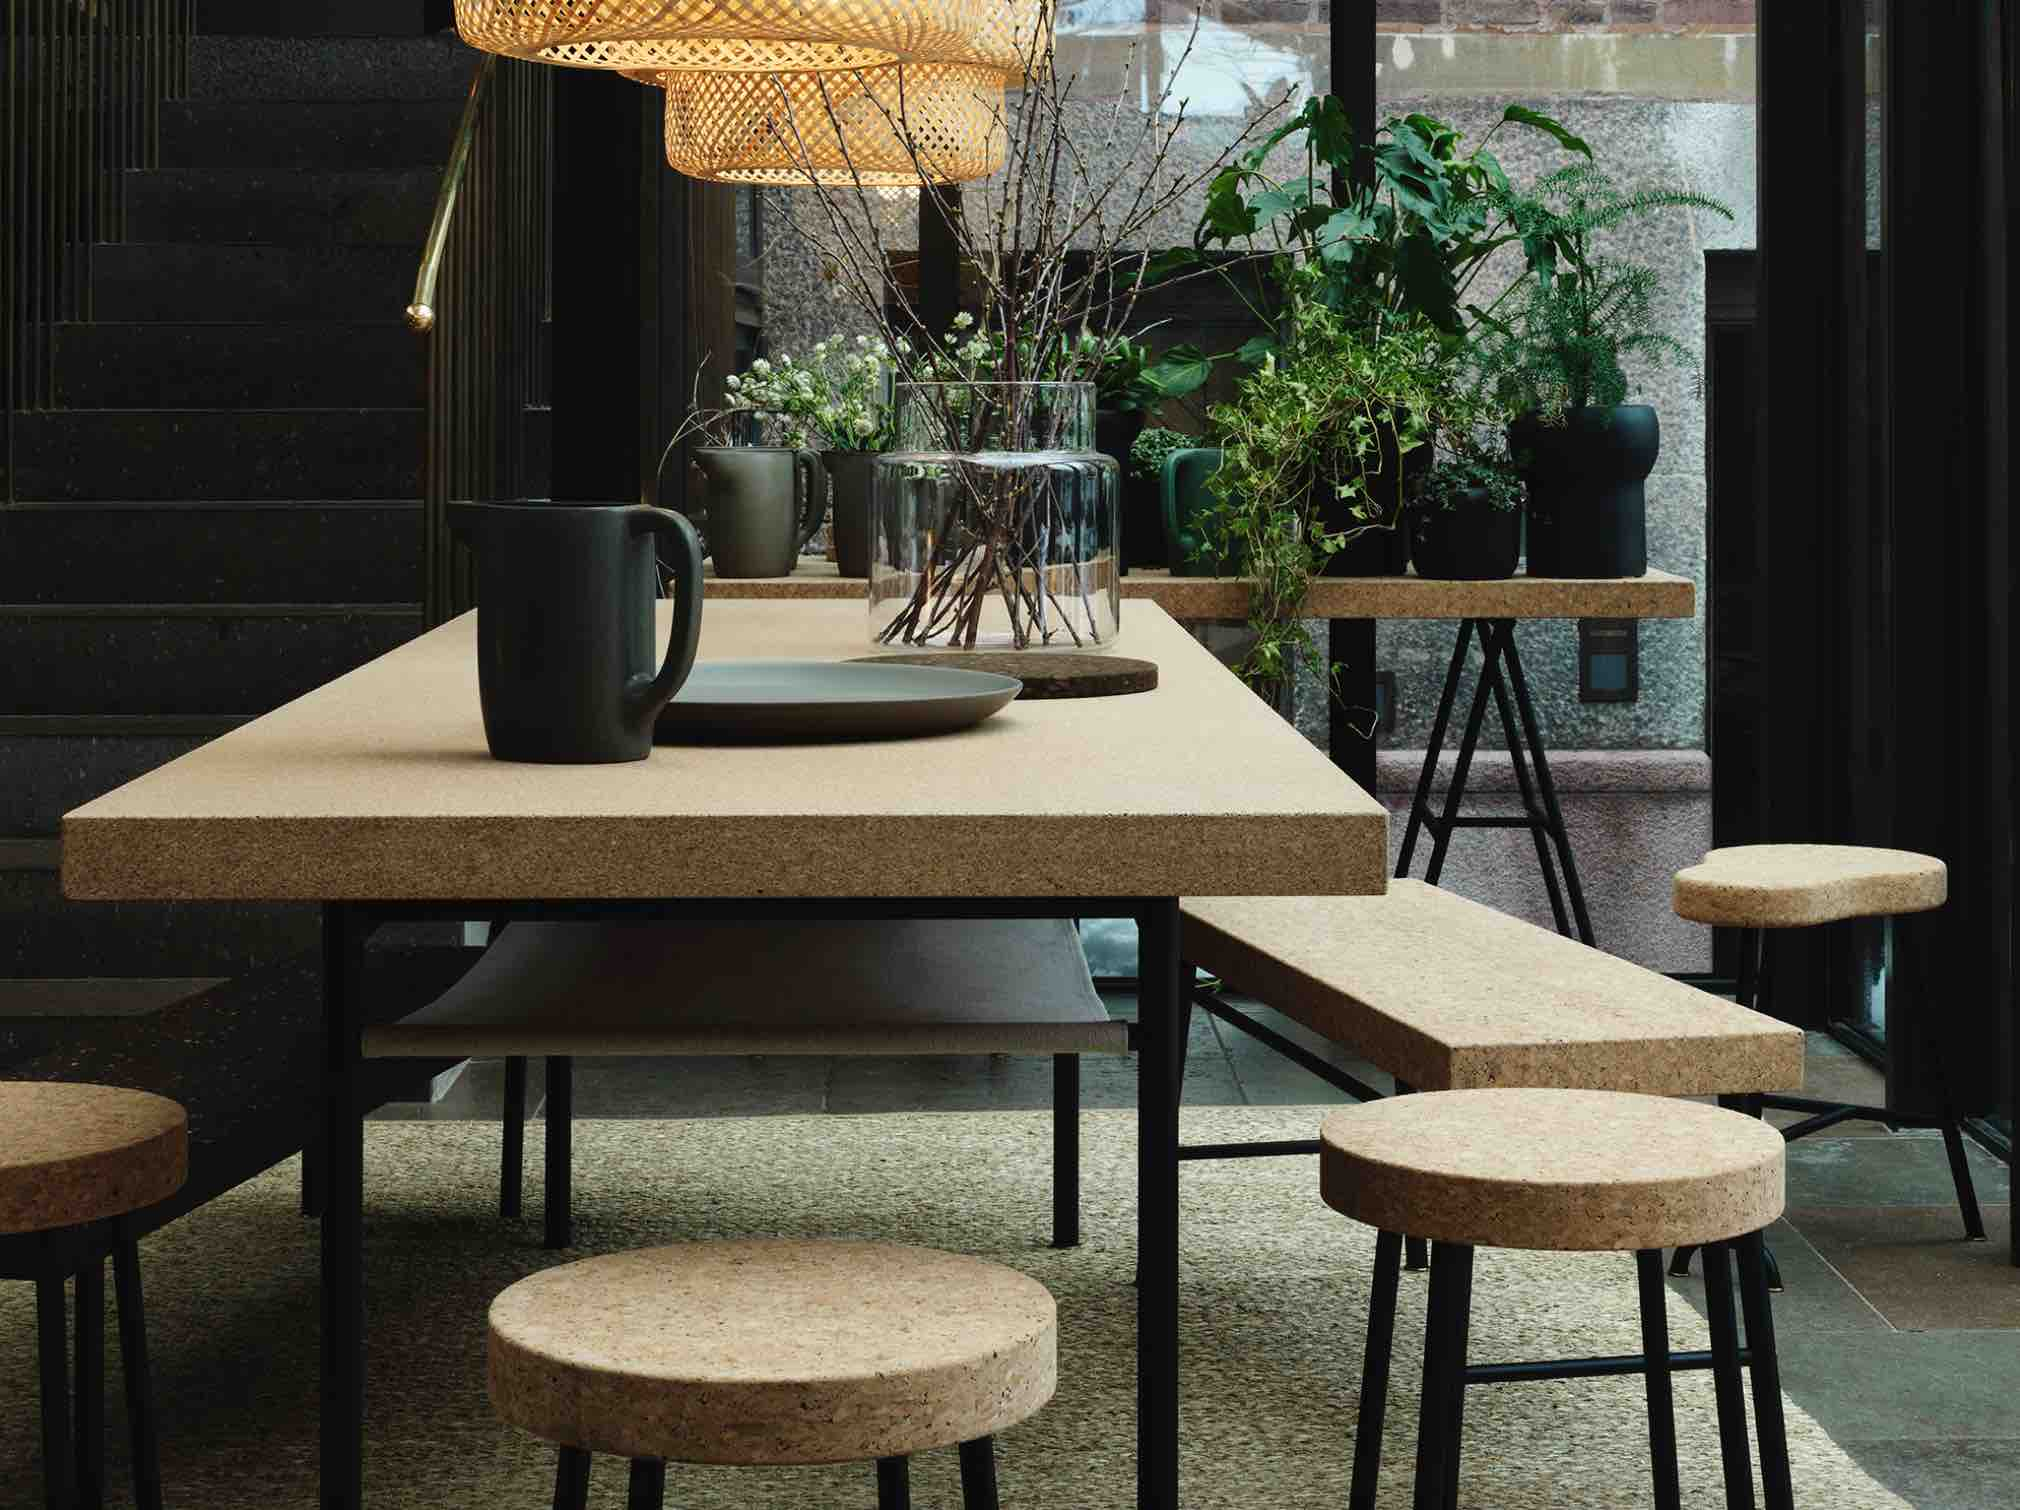 ikea sinnerlig kollektion labelfrei me. Black Bedroom Furniture Sets. Home Design Ideas